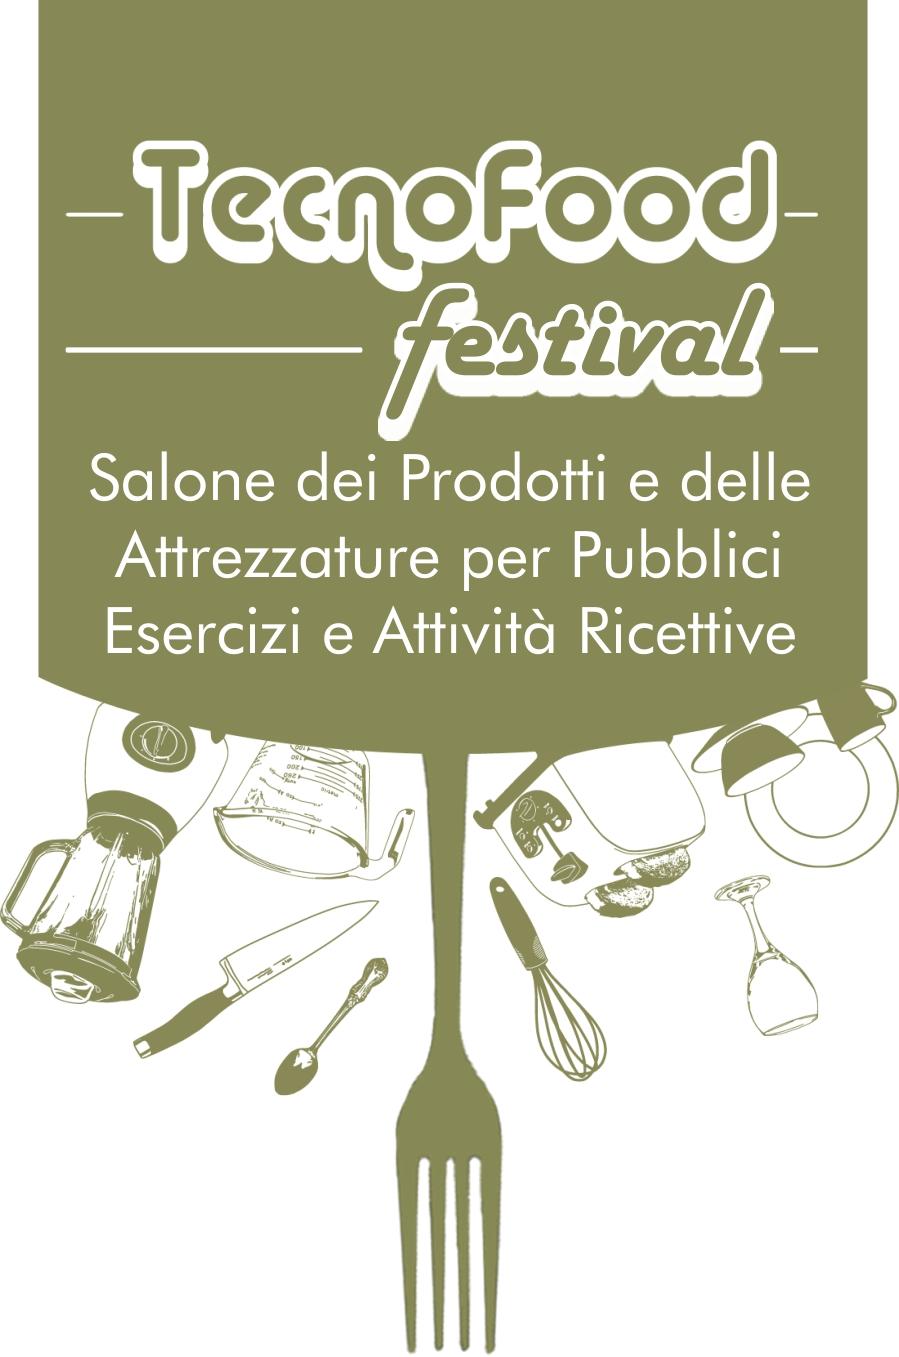 Tecnofood Festival 2013